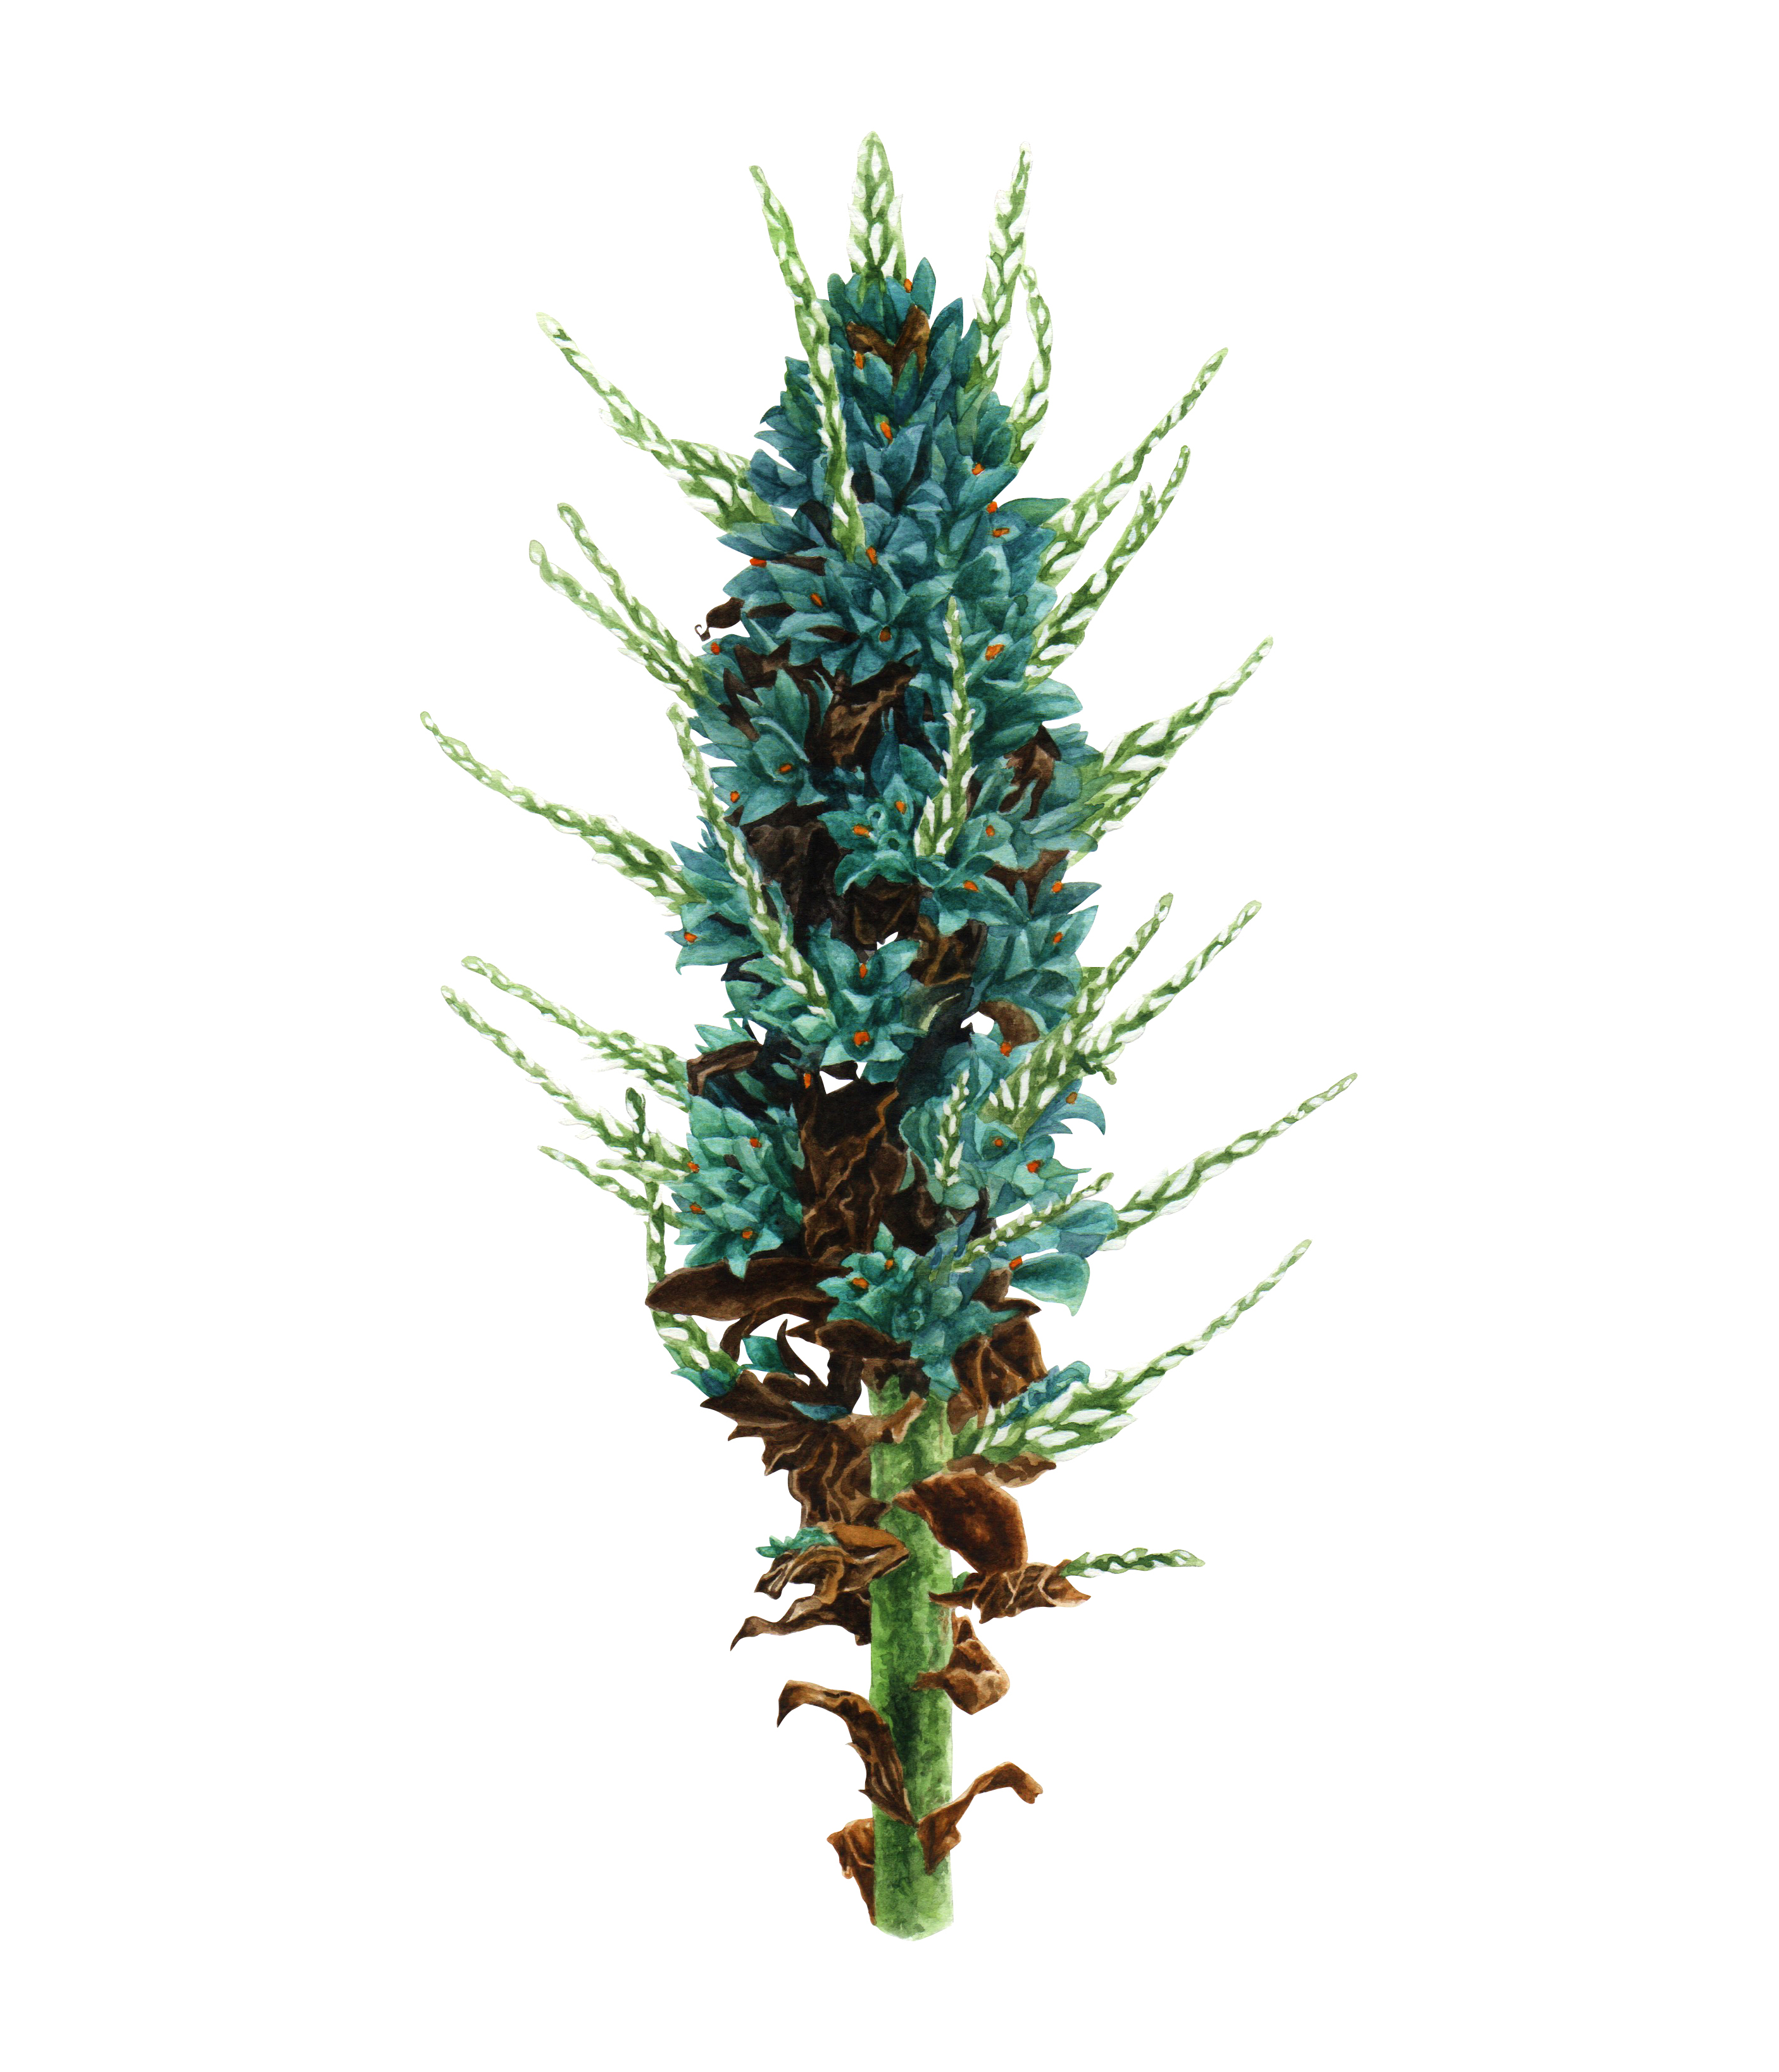 Chagual azul